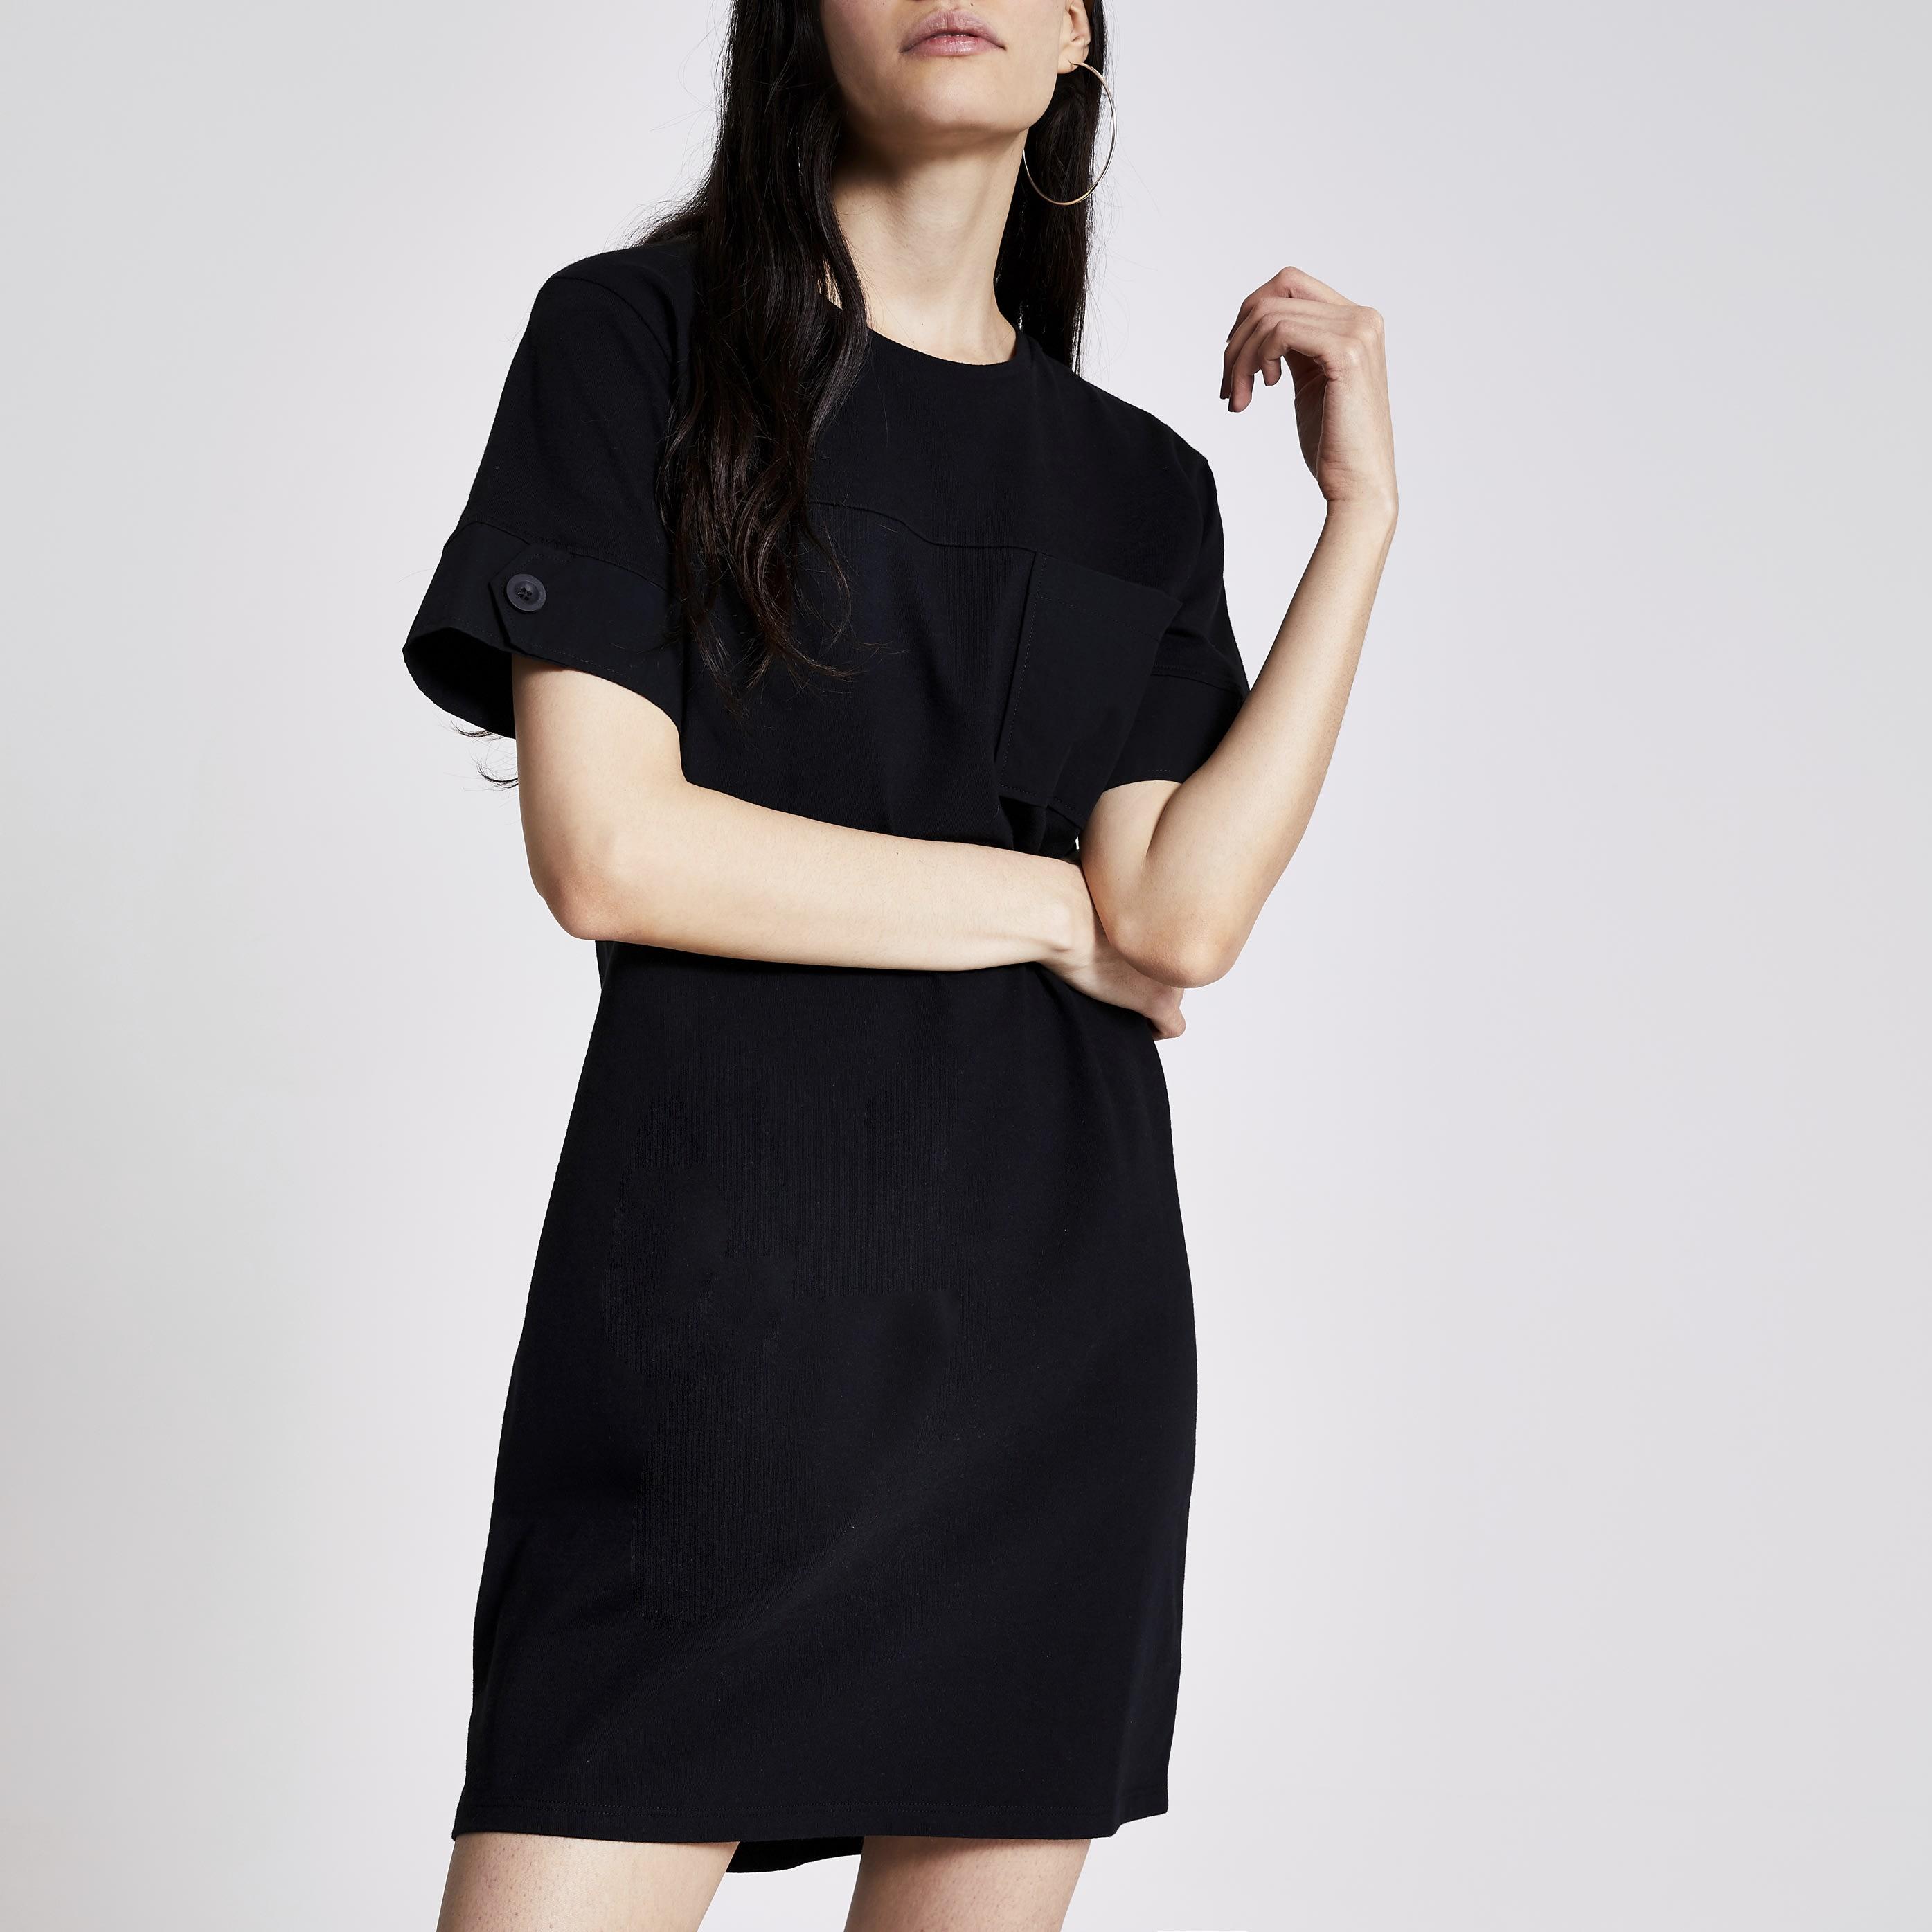 river island Womens Black chest pocket mini T-shirt dress (6)